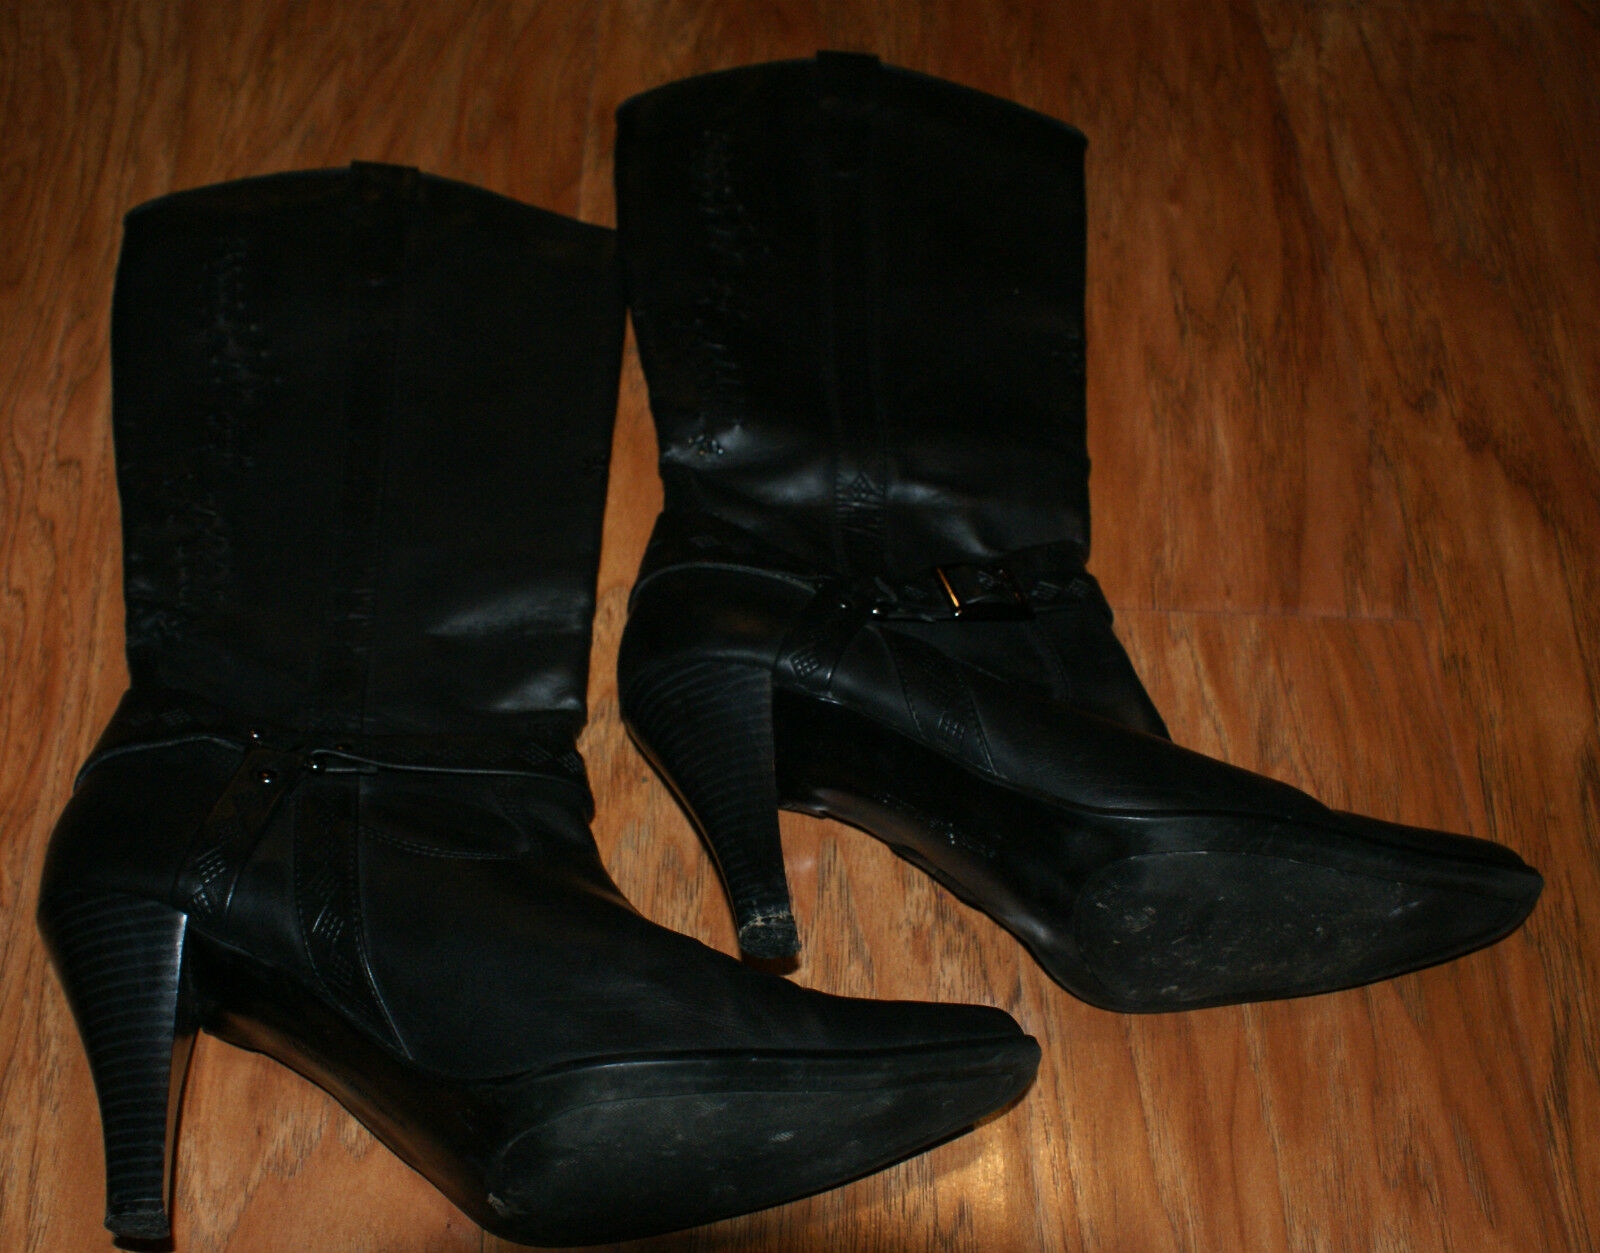 Victoria Spenser Womens Boots Size 10 M Black Style Traci